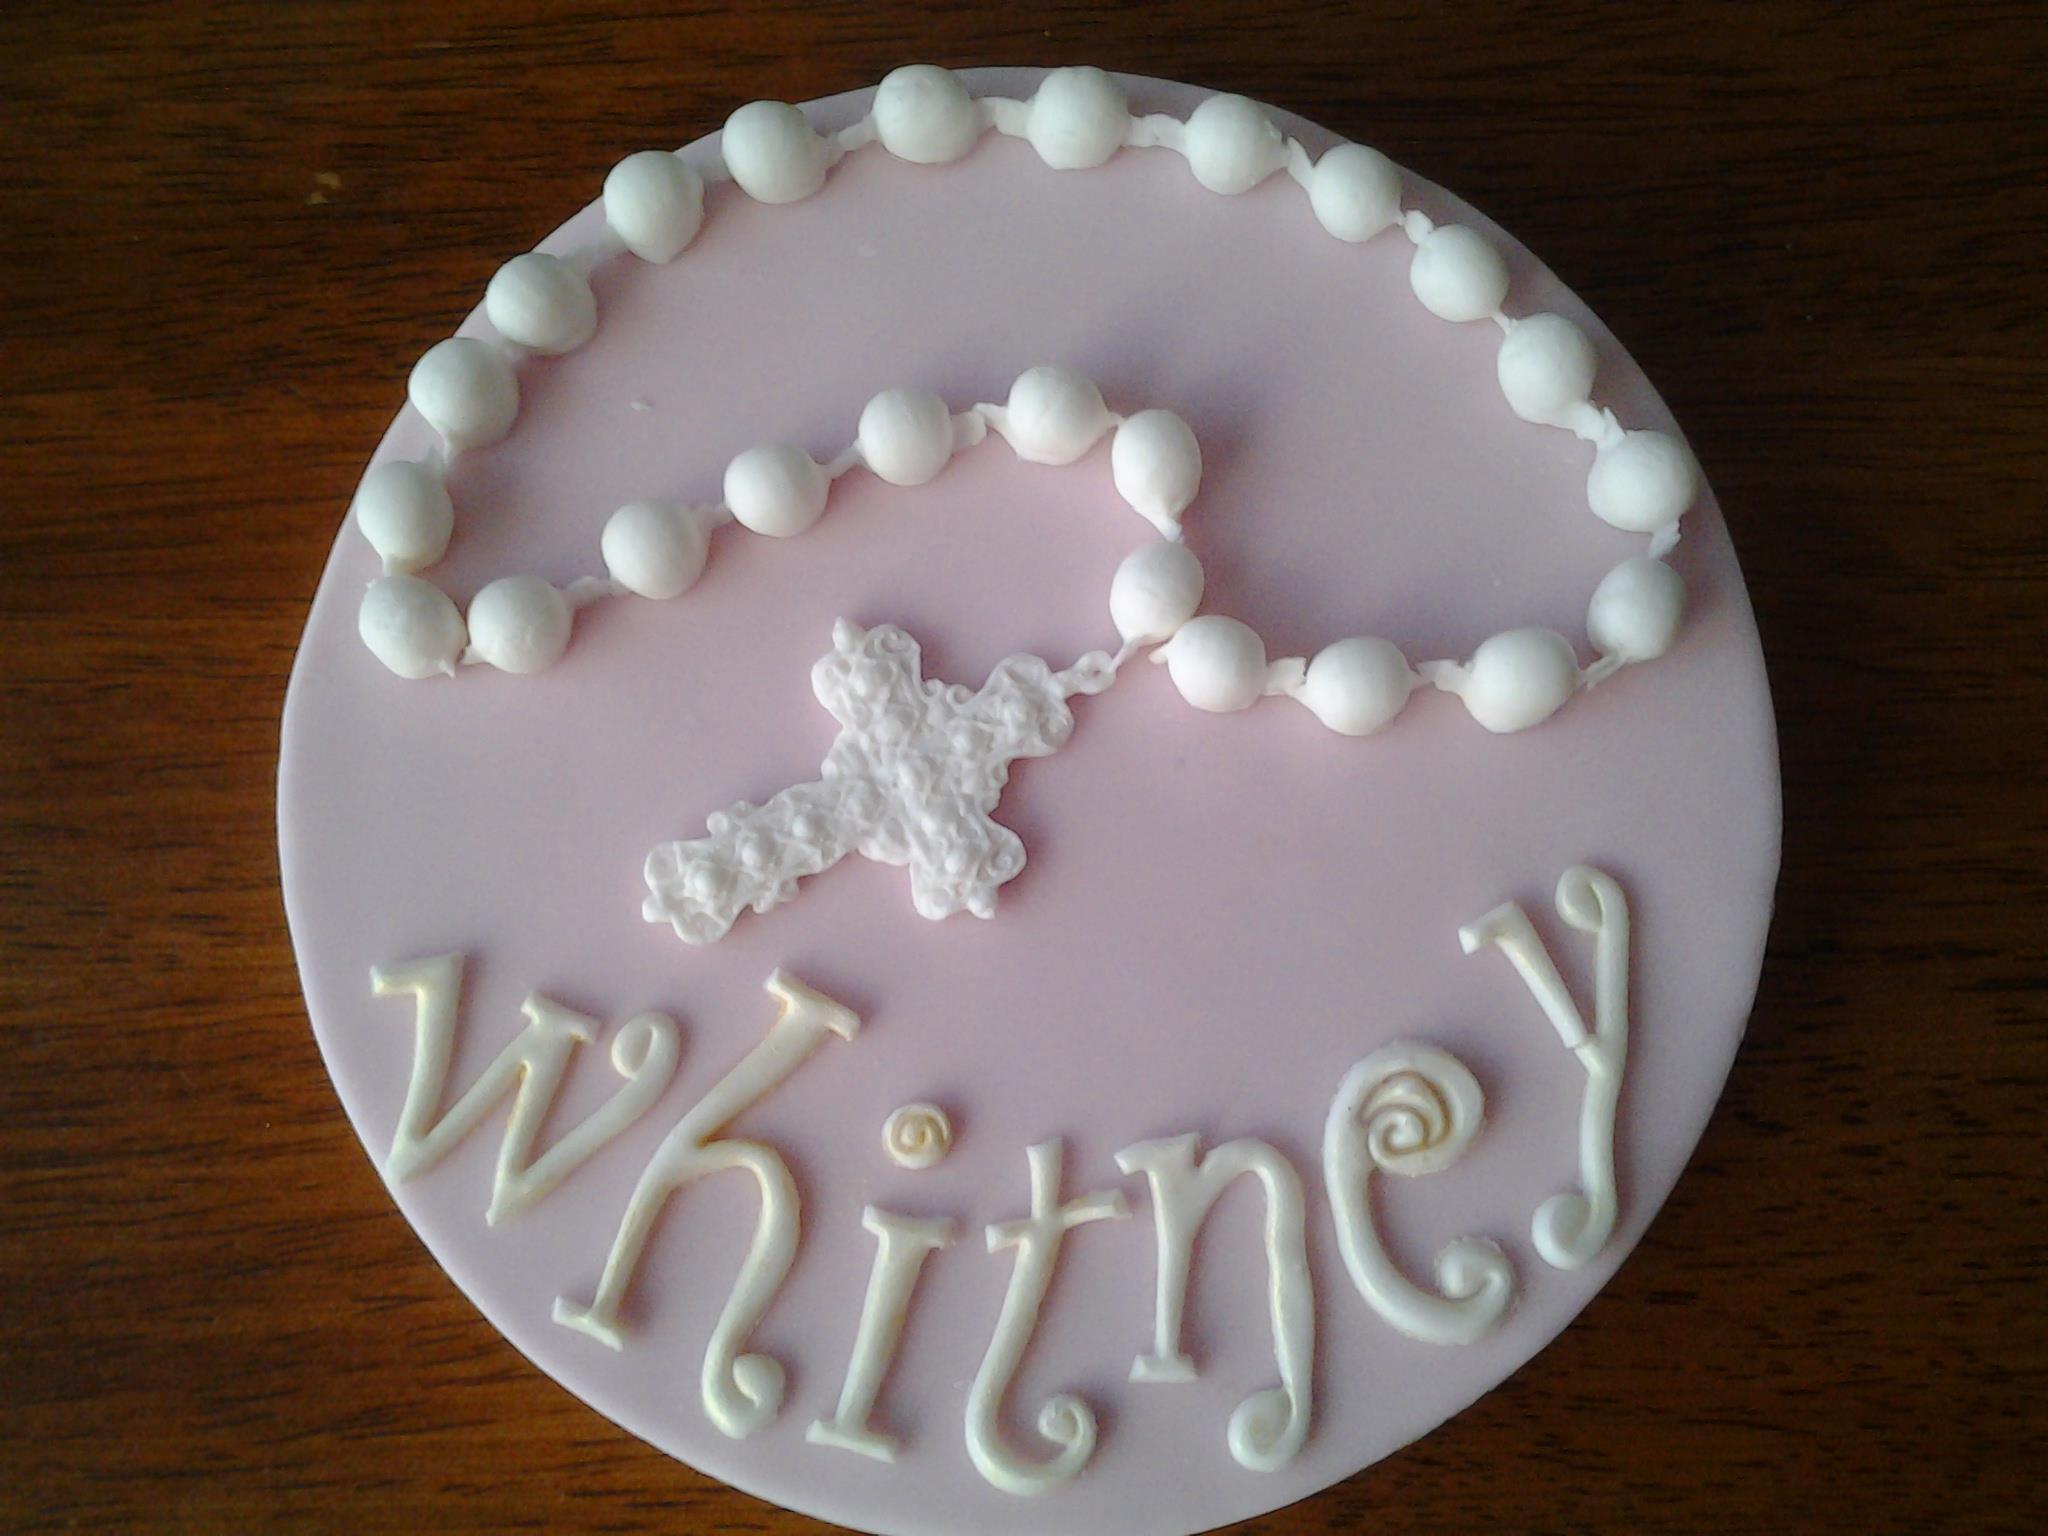 Rosary bead christening cake